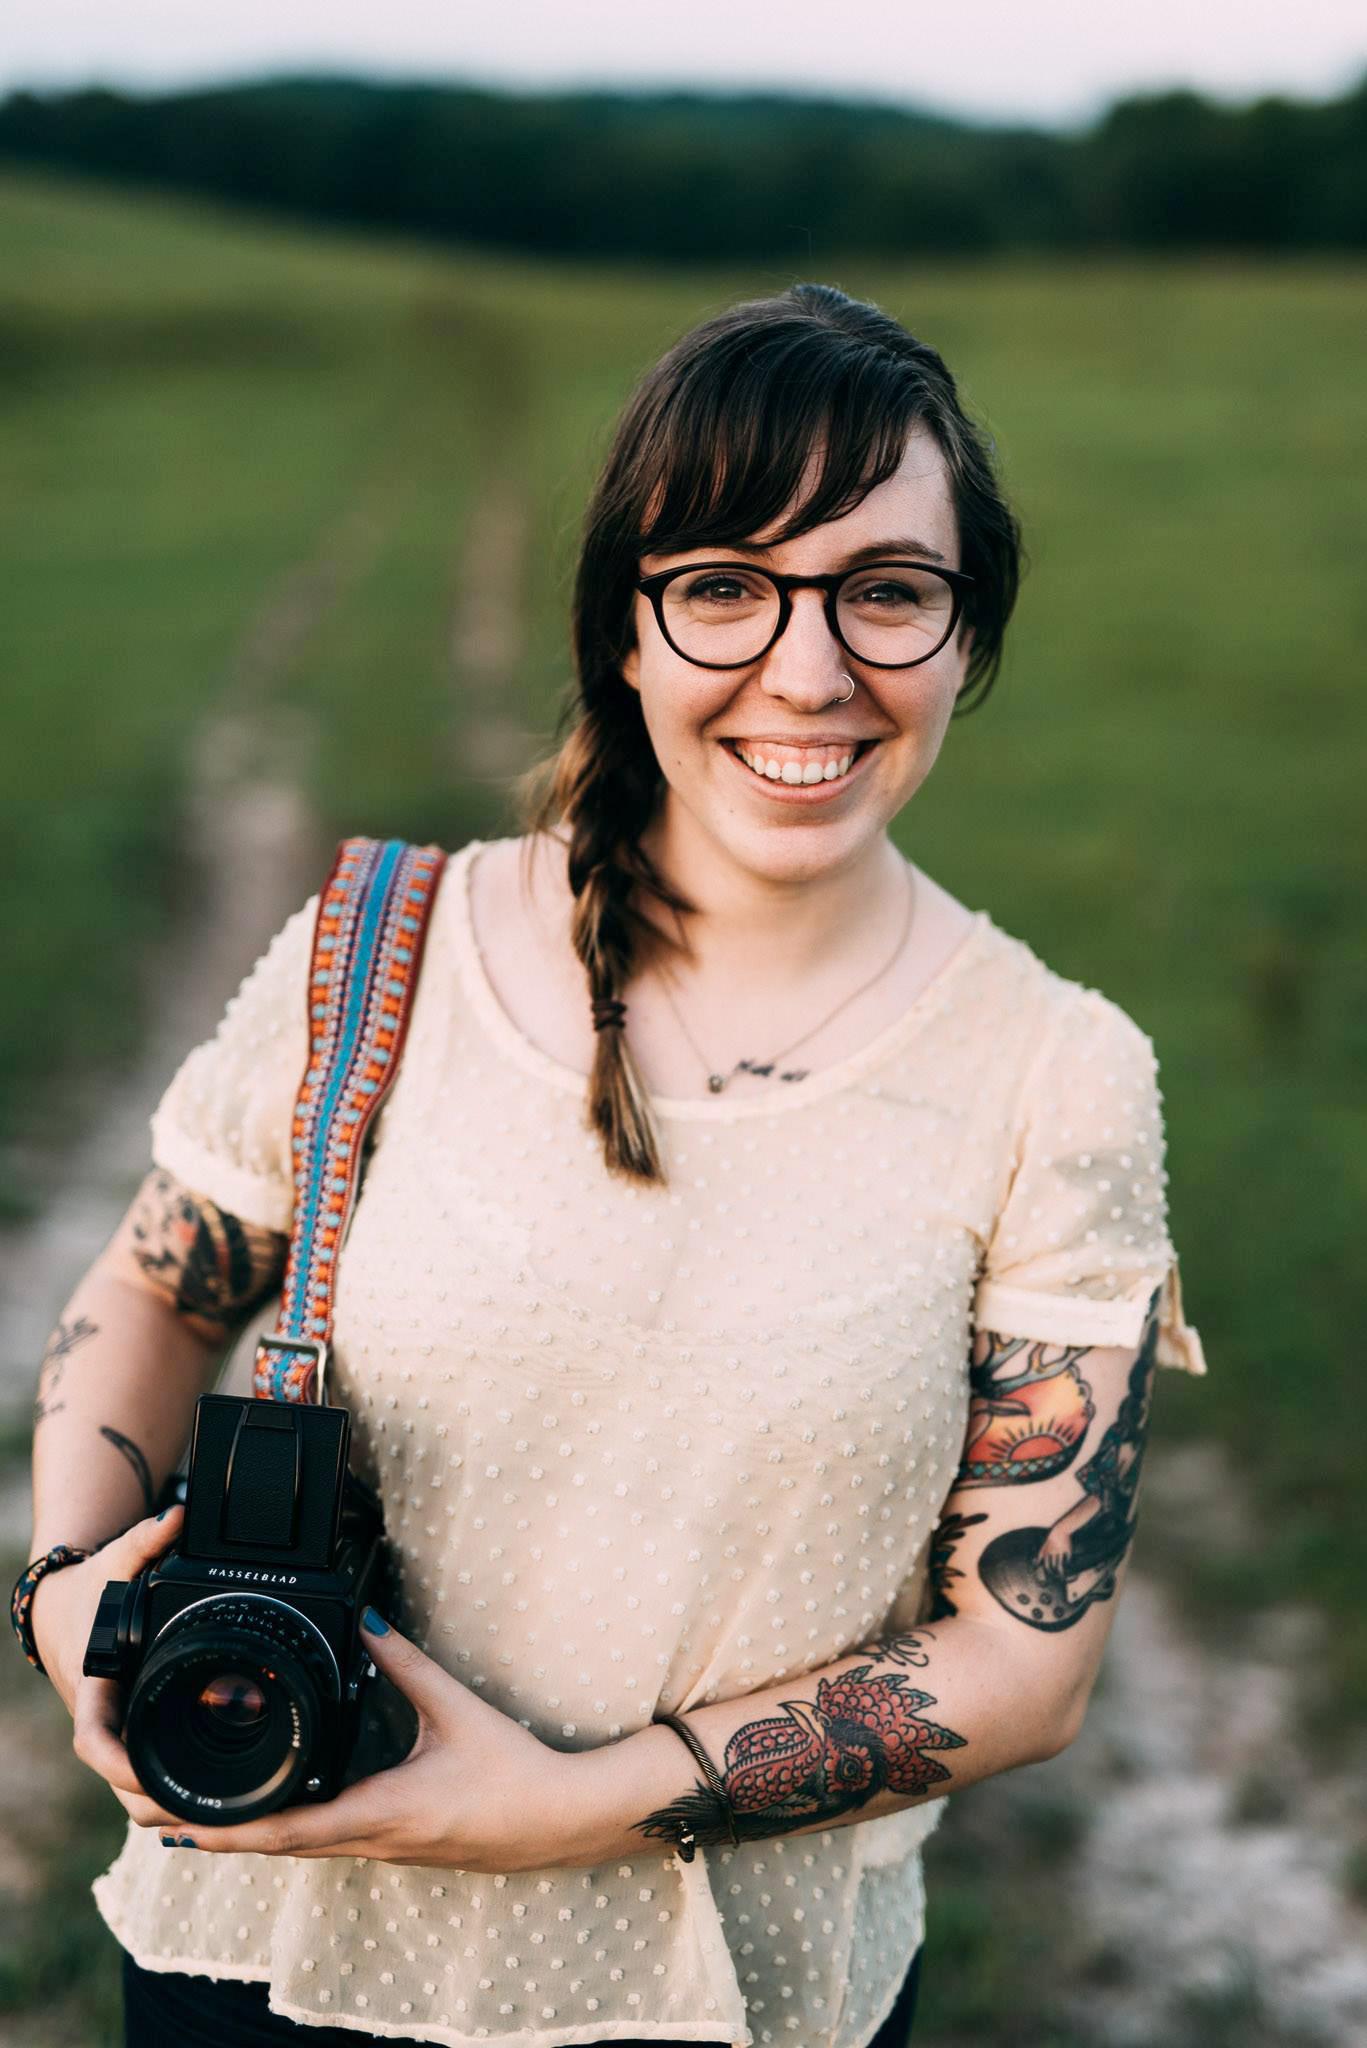 Georgia Wedding Photographer Kate Lamb of Wild in Love Photo